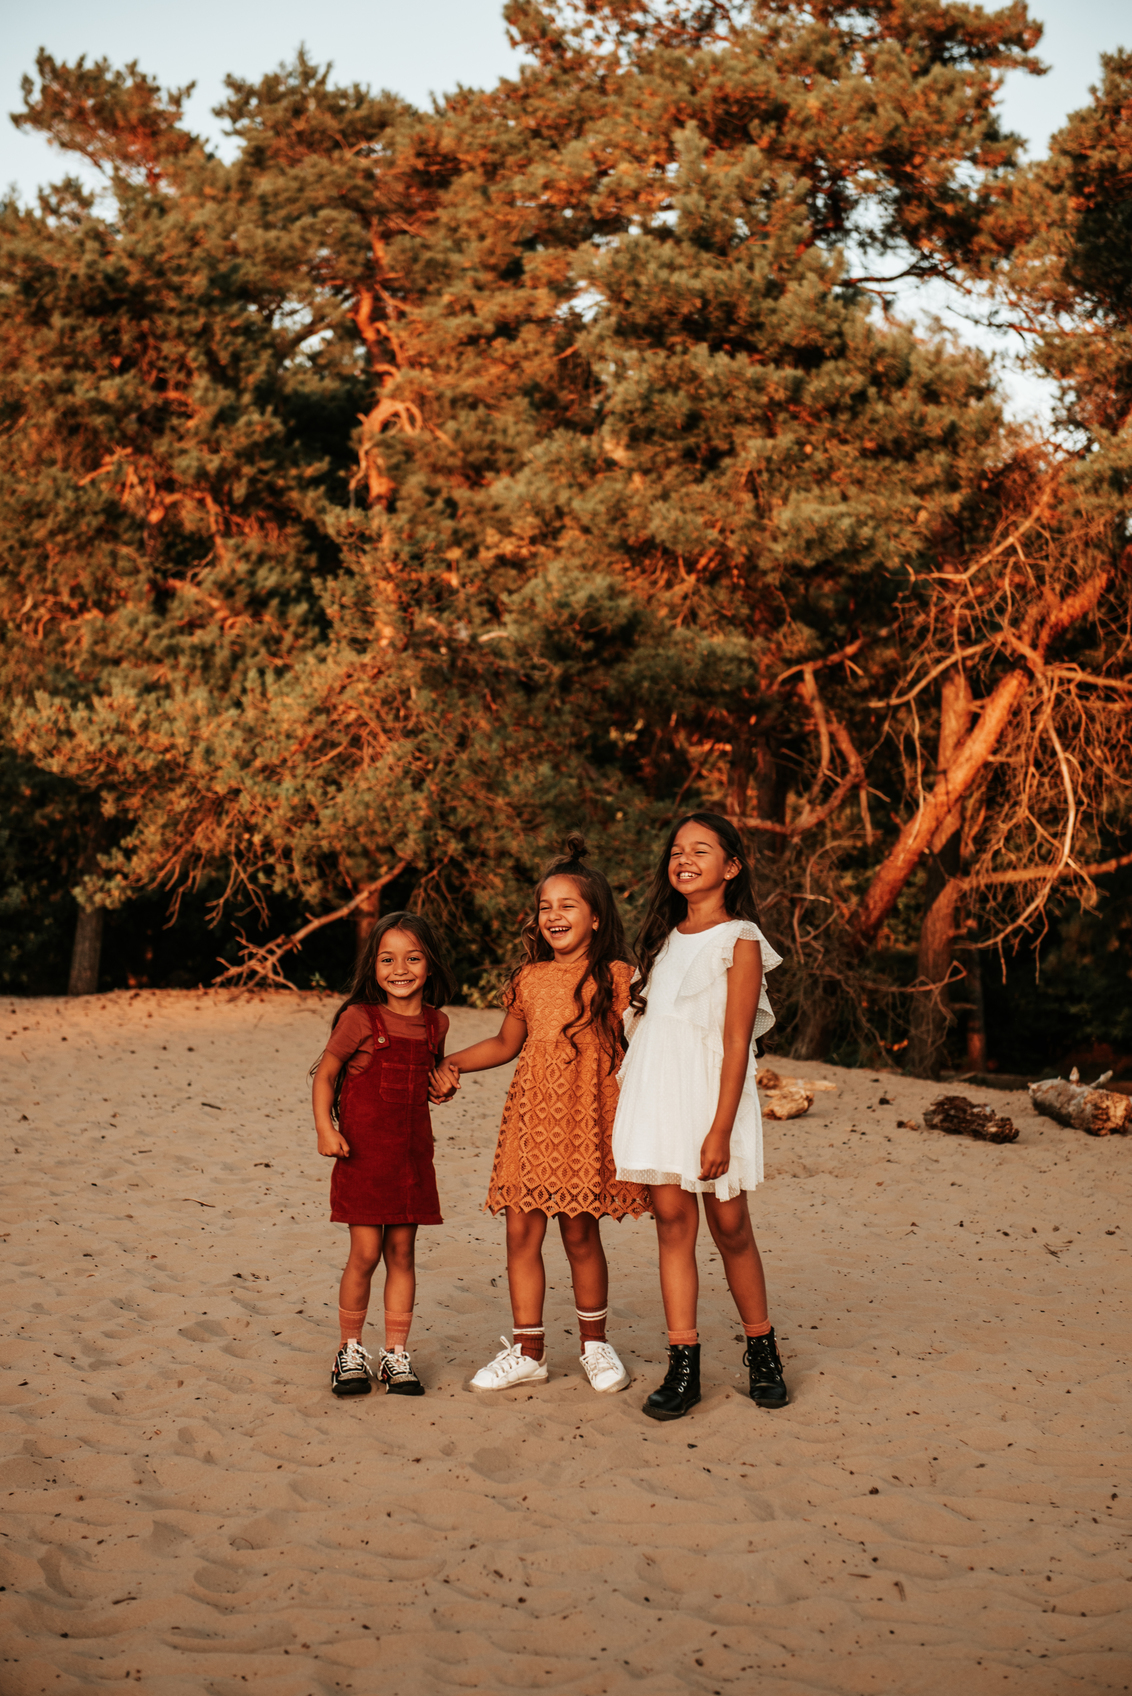 Zusjes - Wat hebben we veel gelachen tijdens deze shoot!  Zusjes Chelsea, Fayenne en Avalon - foto door Jiscafotografie op 31-10-2020 - deze foto bevat: kleur, portret, liefde, zomer, daglicht, kind, kinderen, nikon, lachen, meisje, lief, zonlicht, lach, familie, nijmegen, vrolijk, warmte, jurk, gezin, fotoshoot, blij, zusjes, gouden uur, gezinsfotografie, gezinsfotoshoot